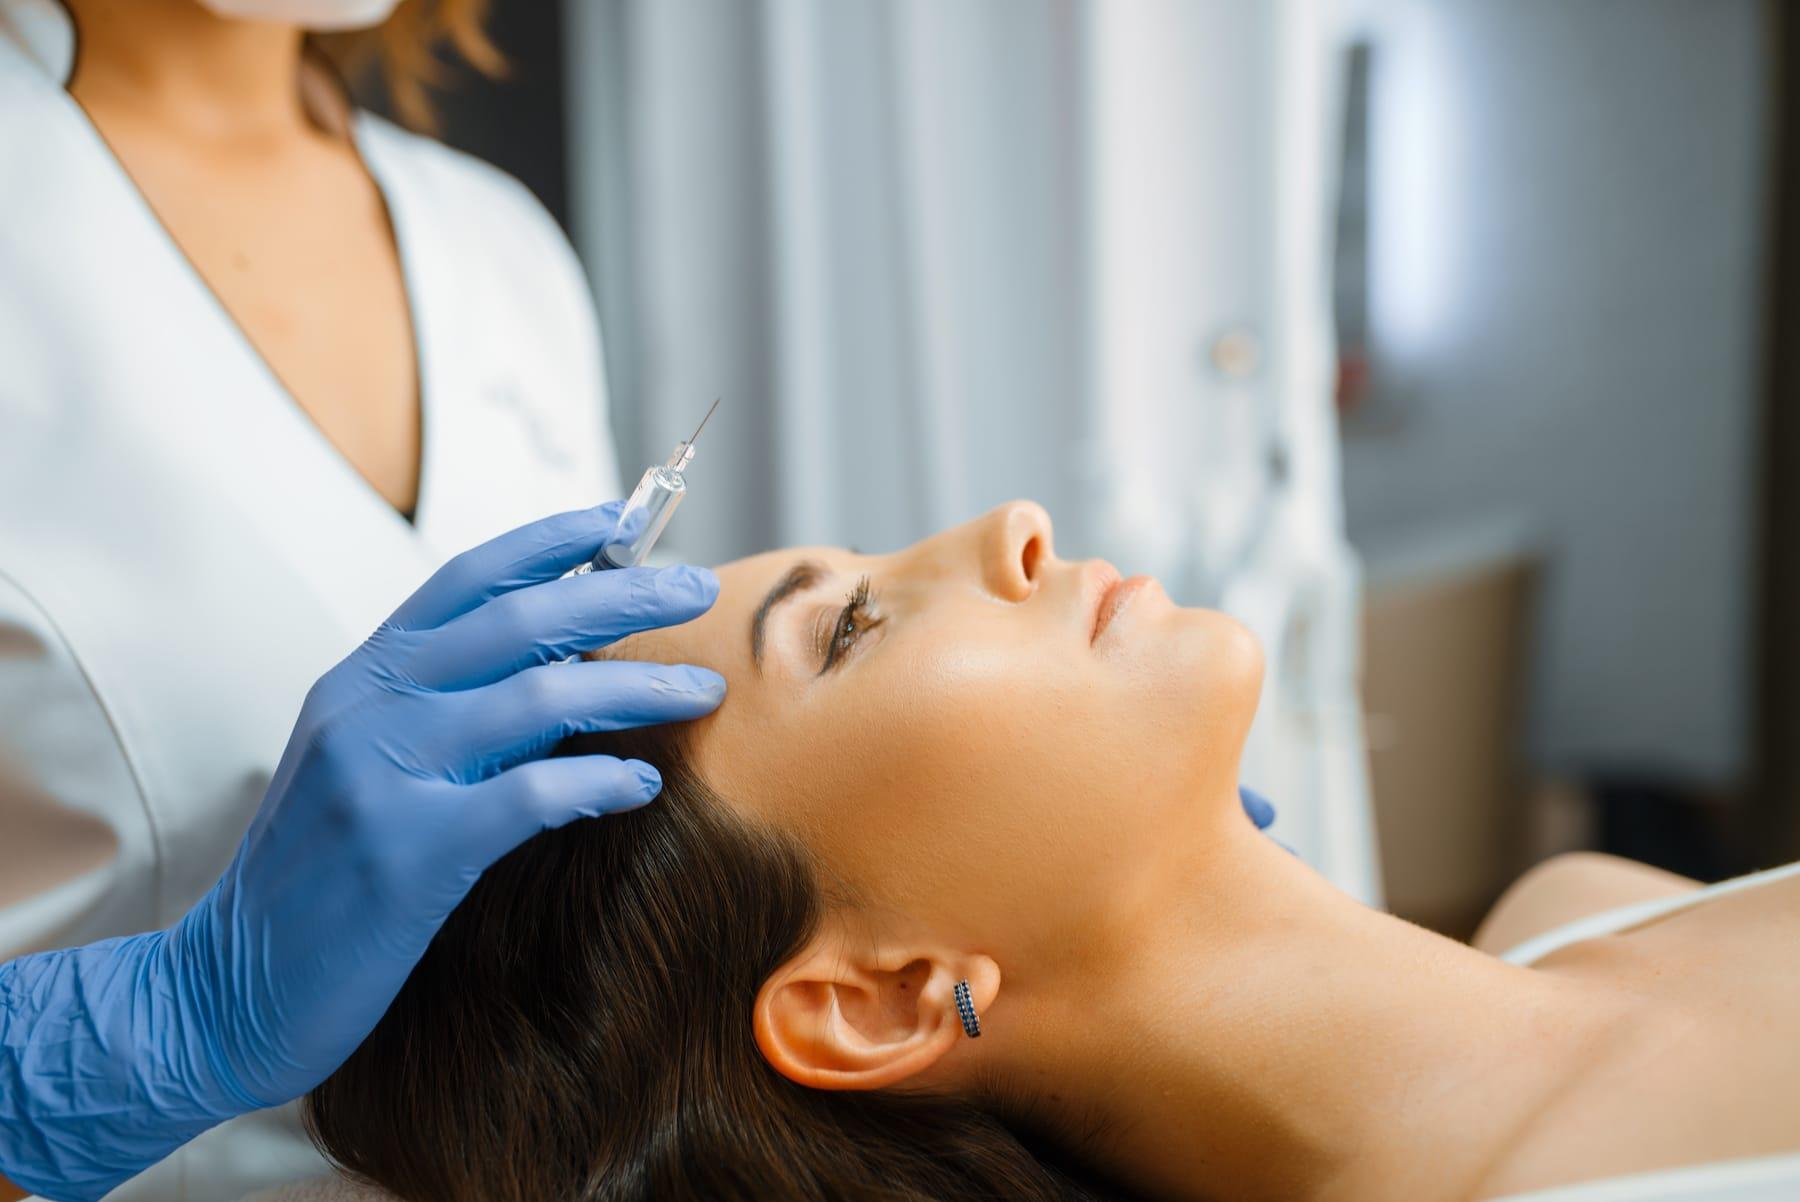 jeuveau vs. botox Injectable Treatments at Buckhead Plastic Surgery Atlanta Jeuveau® vs. Botox® at LUX Med Spa